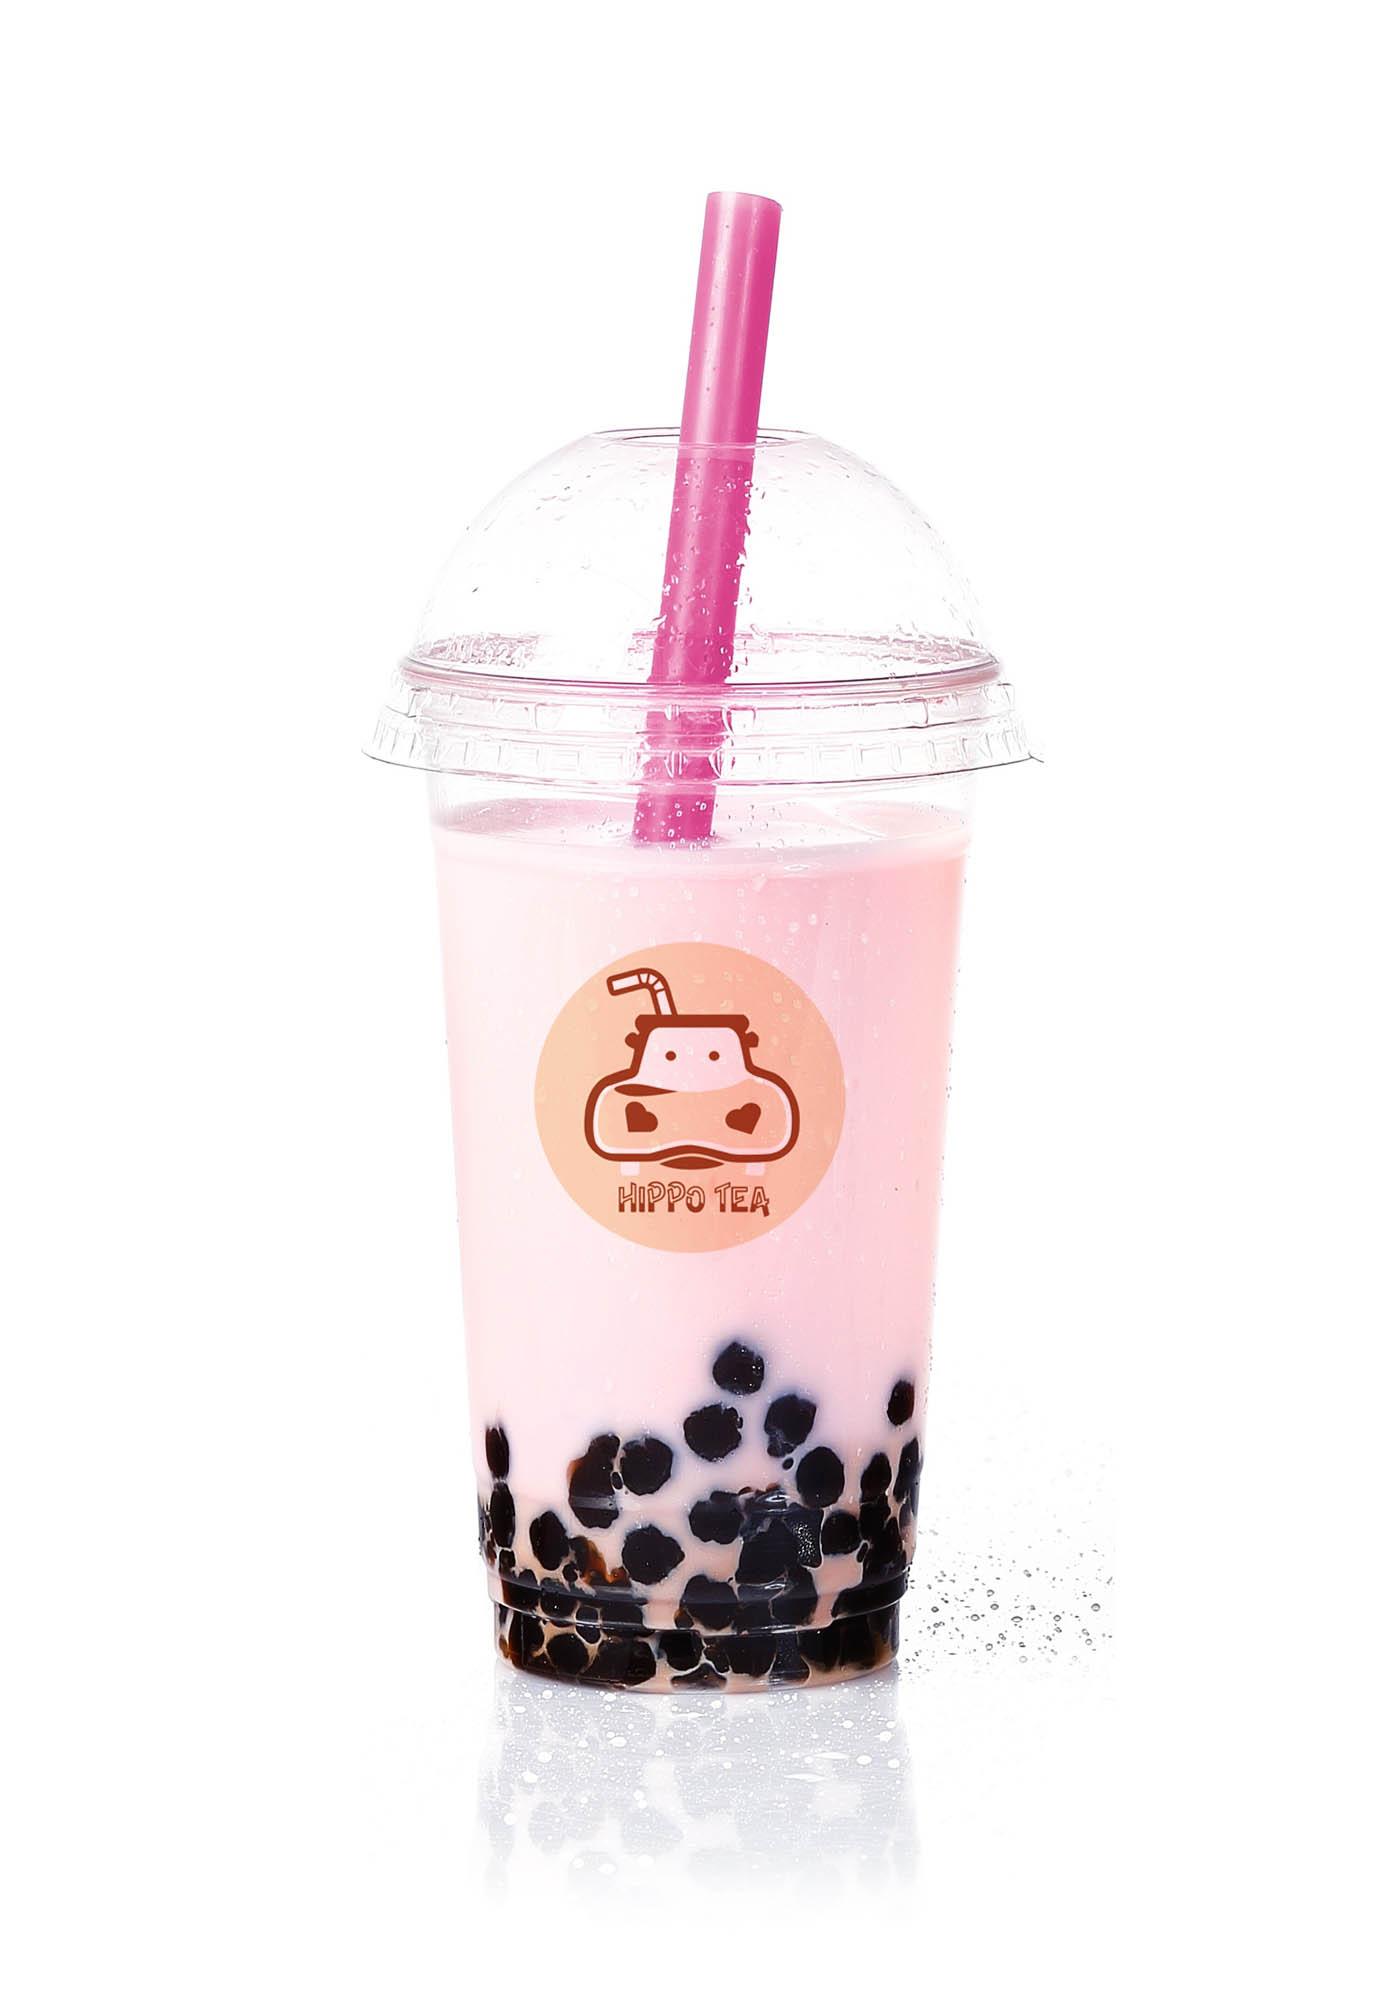 hippo-tea-2